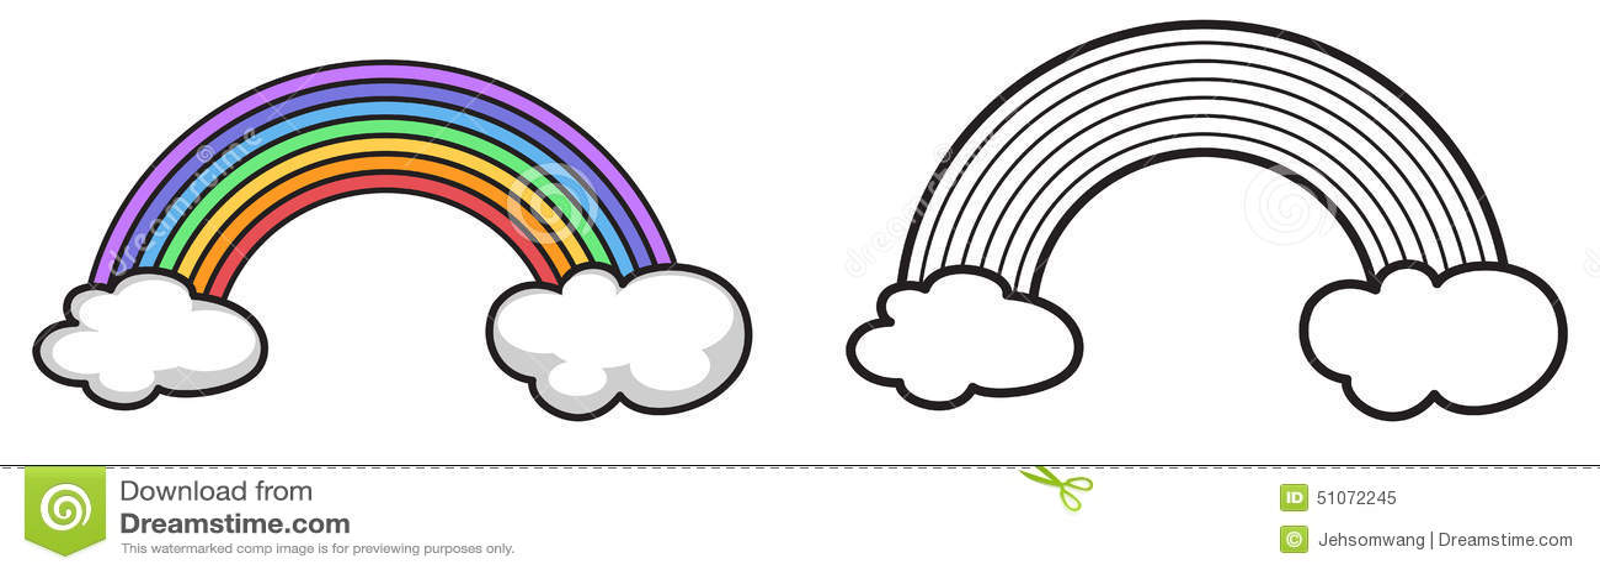 Arco Iris Colorido E Preto E Branco Para O Livro Para Colorir